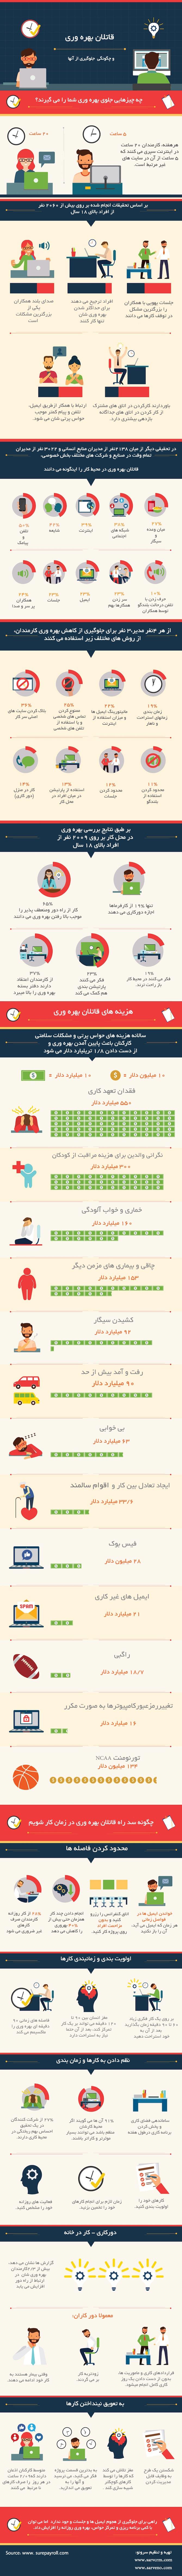 ProductivityInfographic